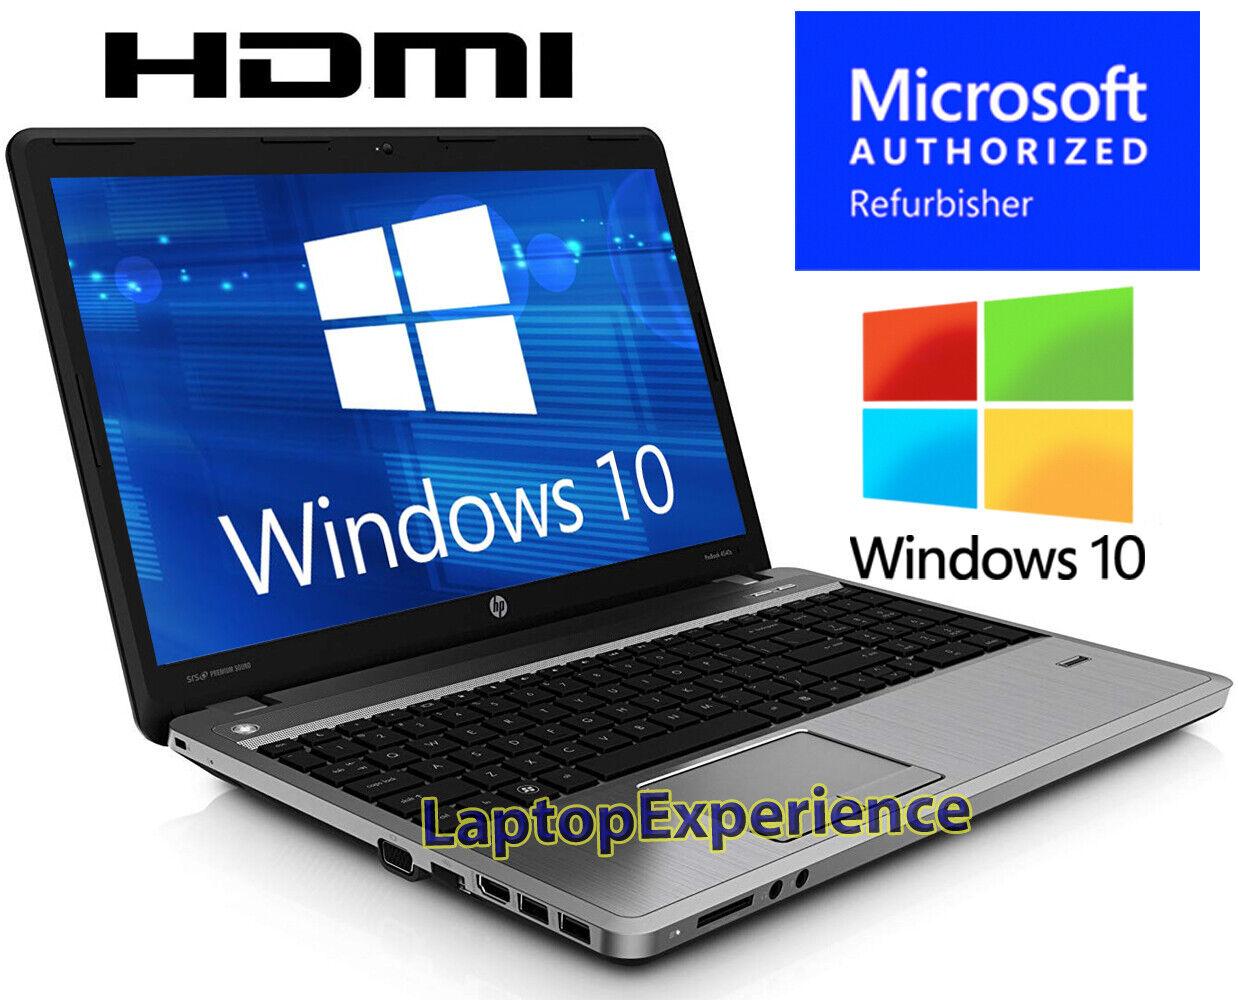 Laptop Windows - HP ProBook LAPTOP COMPUTER DUAL CORE 2.4GHz 4GB 320GB 15.6 Windows 10 KEY WEBCAM